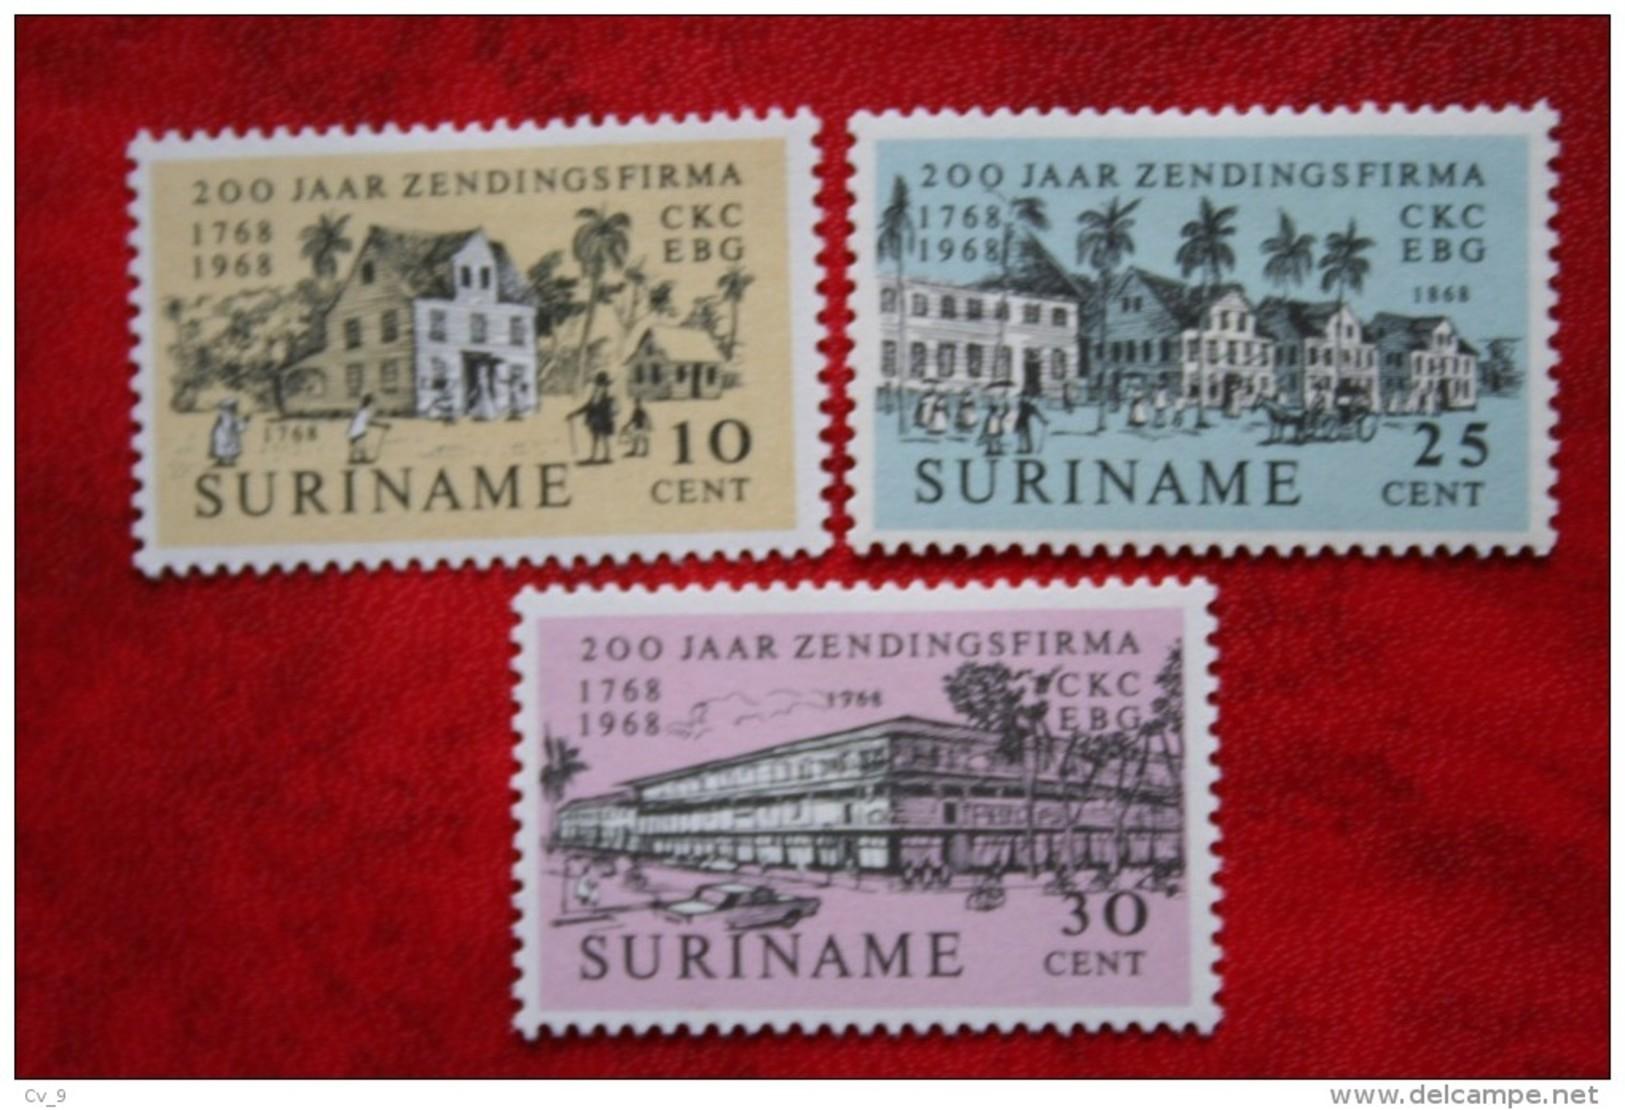 Zendingsfirma CKC ; NVPH Nr: 499-501 Mi 542-544 ; 1968 POSTFRIS MNH ** SURINAME / SURINAM - Surinam ... - 1975